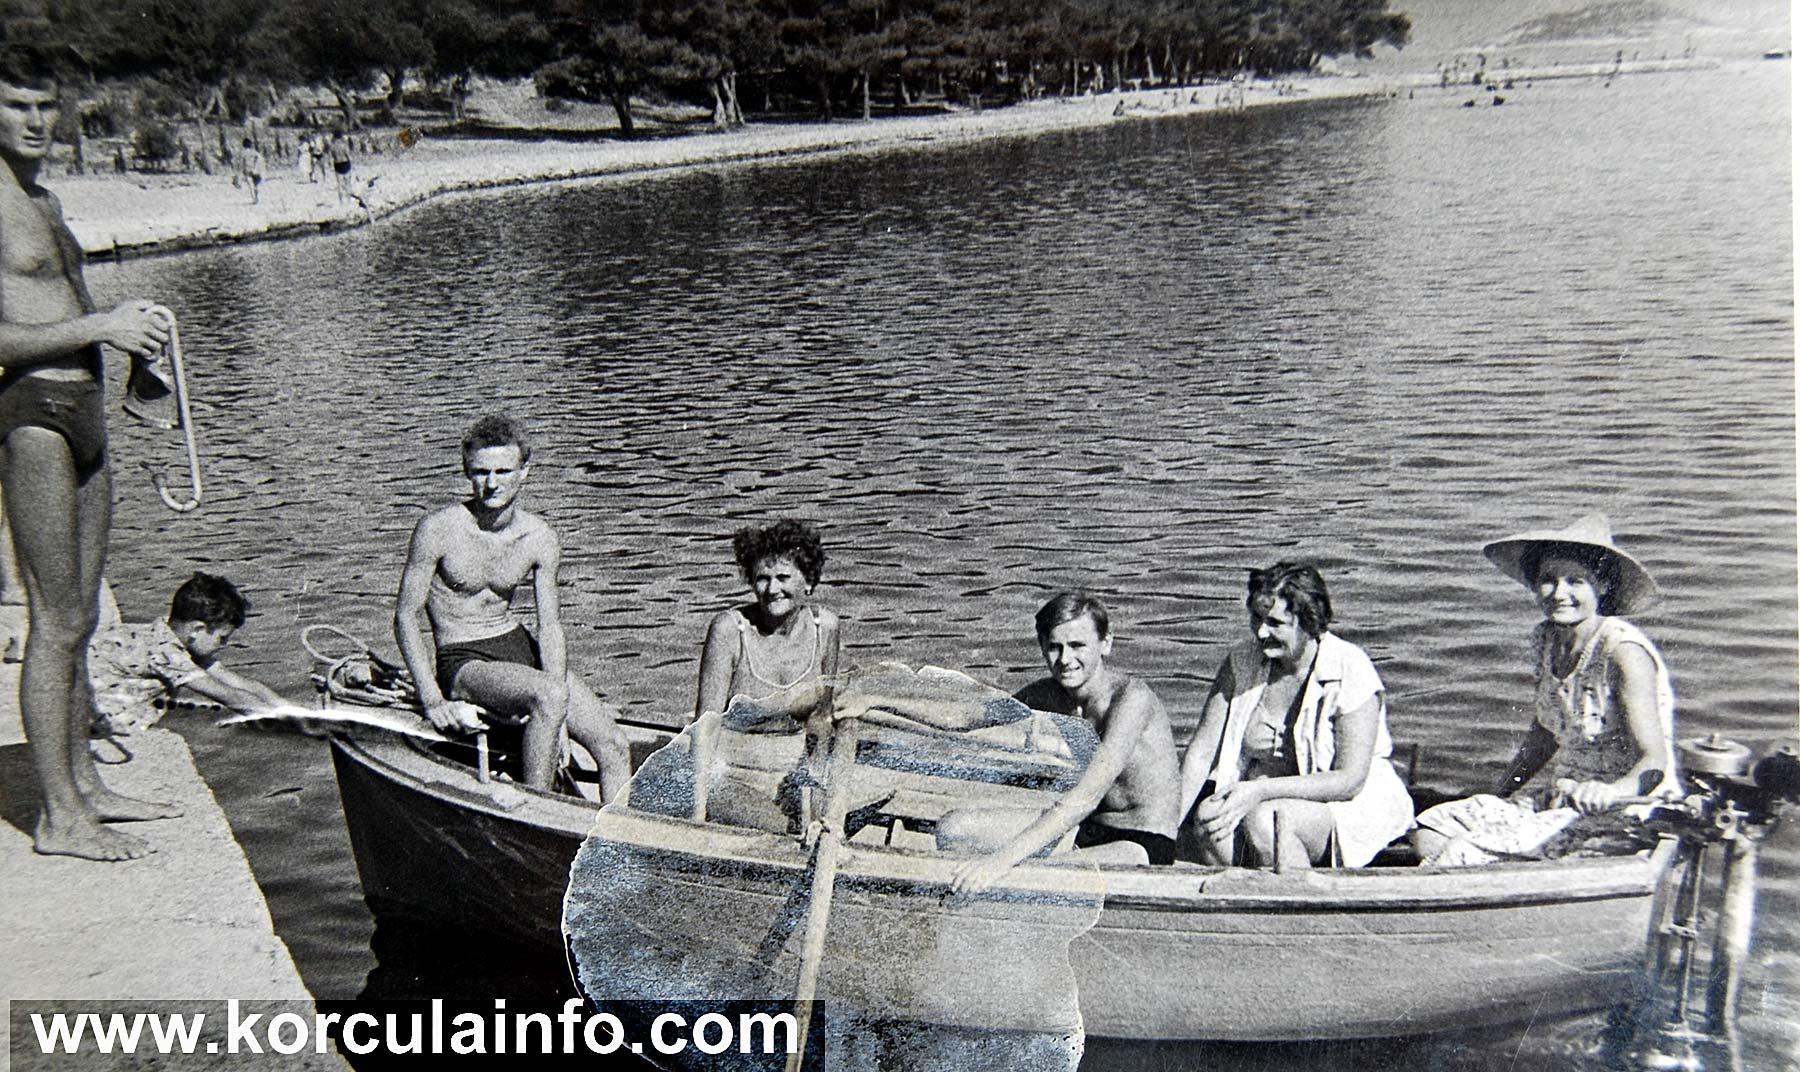 Beach at Badija in 1960s - arrival to Badija island by boat